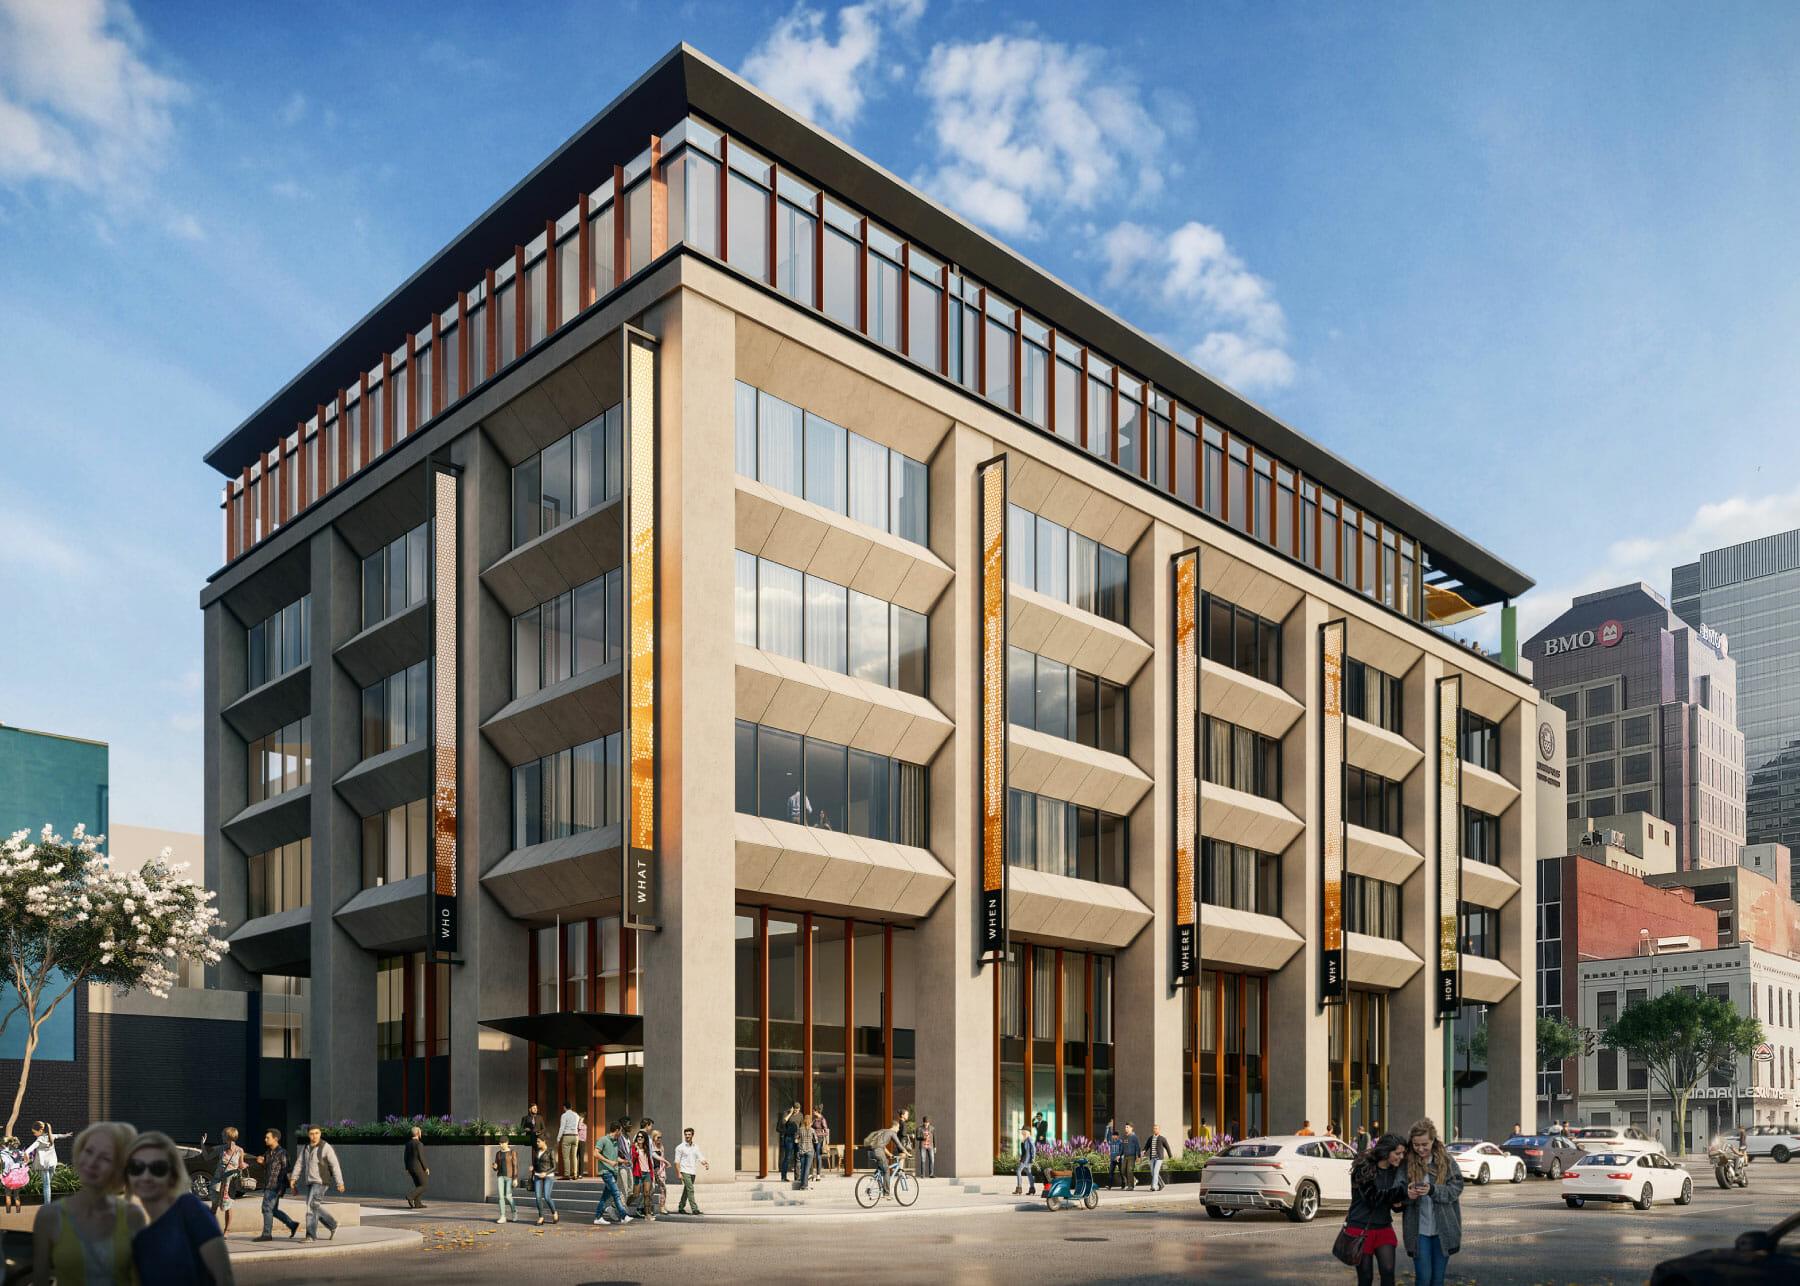 Hotel Indy exterior rendering